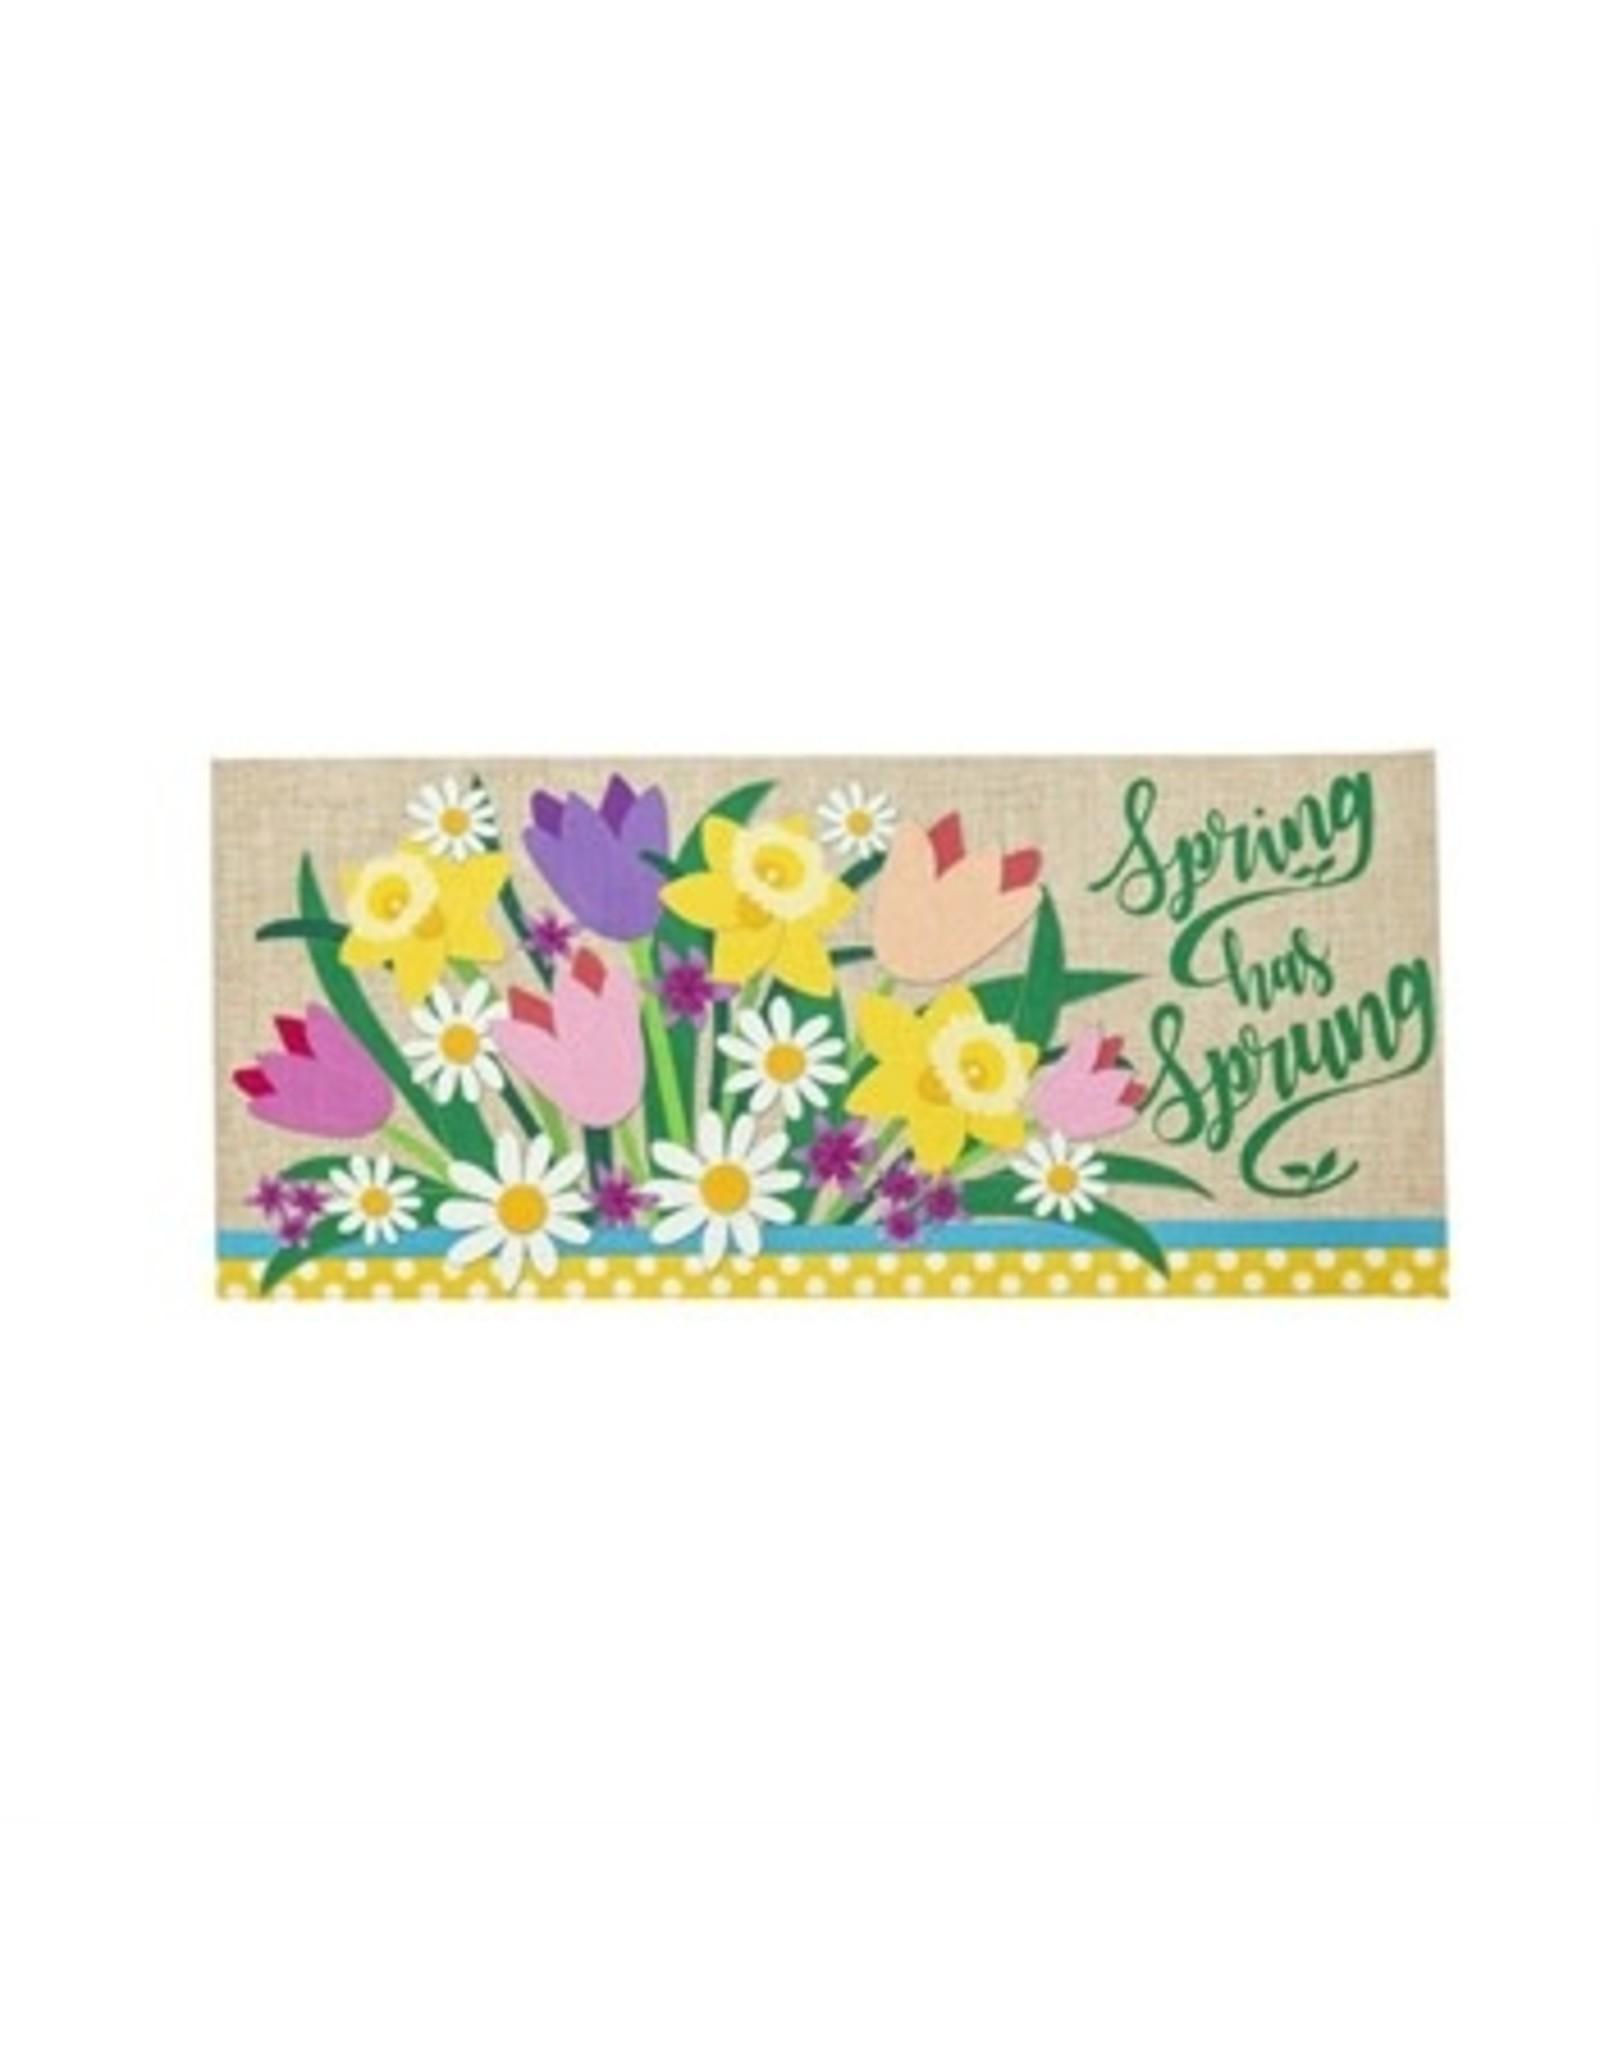 Switch Mat, Spring Has Sprung